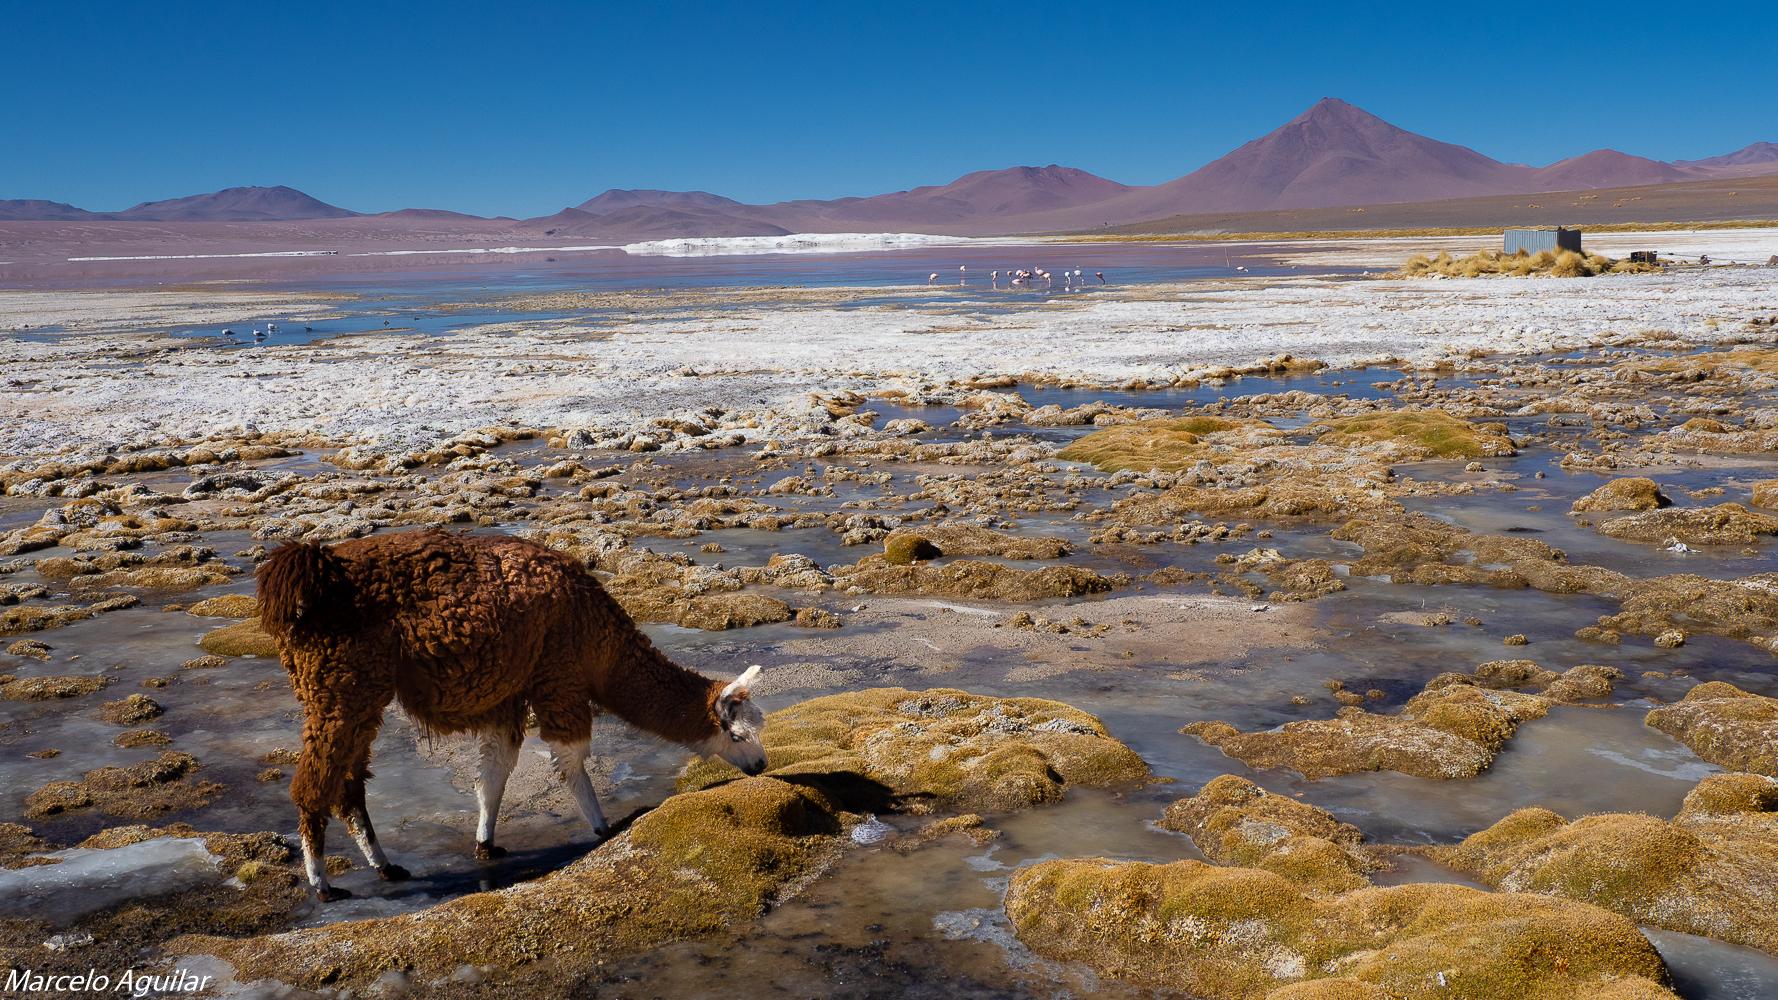 LLama en laguna colorada, Bolivia